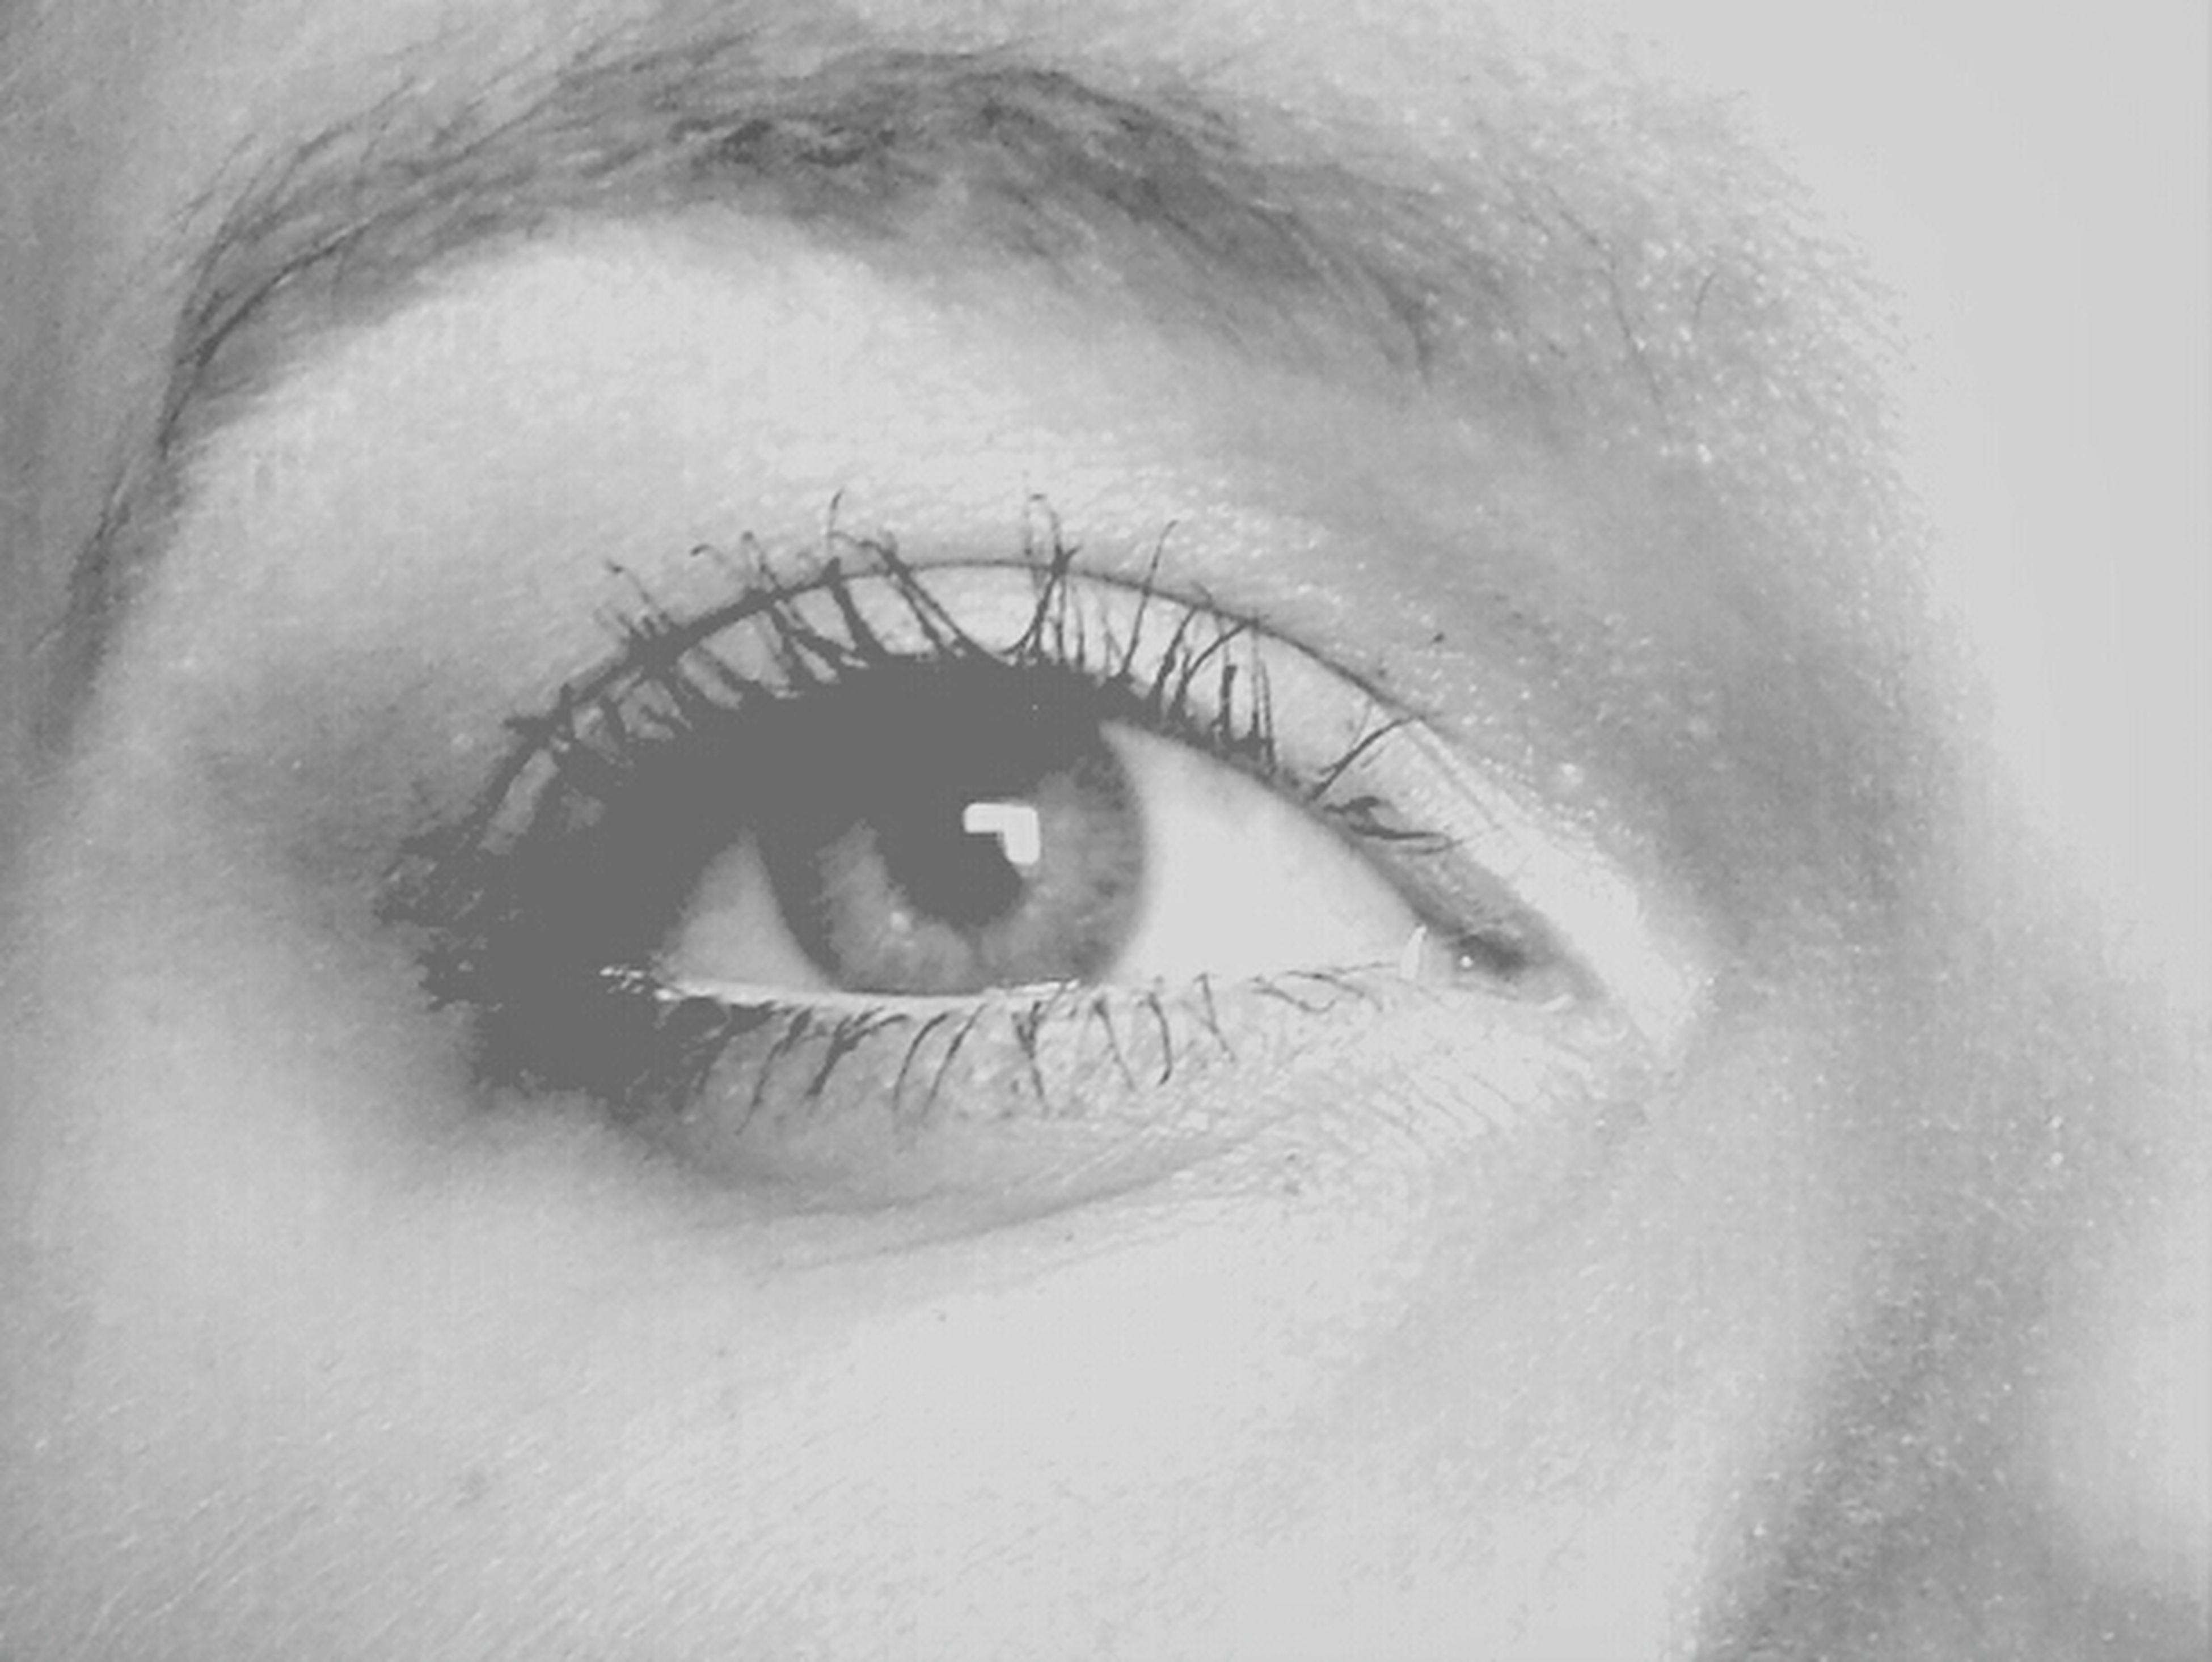 close-up, human eye, eyelash, indoors, human face, eyesight, part of, human skin, lifestyles, sensory perception, studio shot, headshot, person, looking at camera, extreme close-up, unrecognizable person, portrait